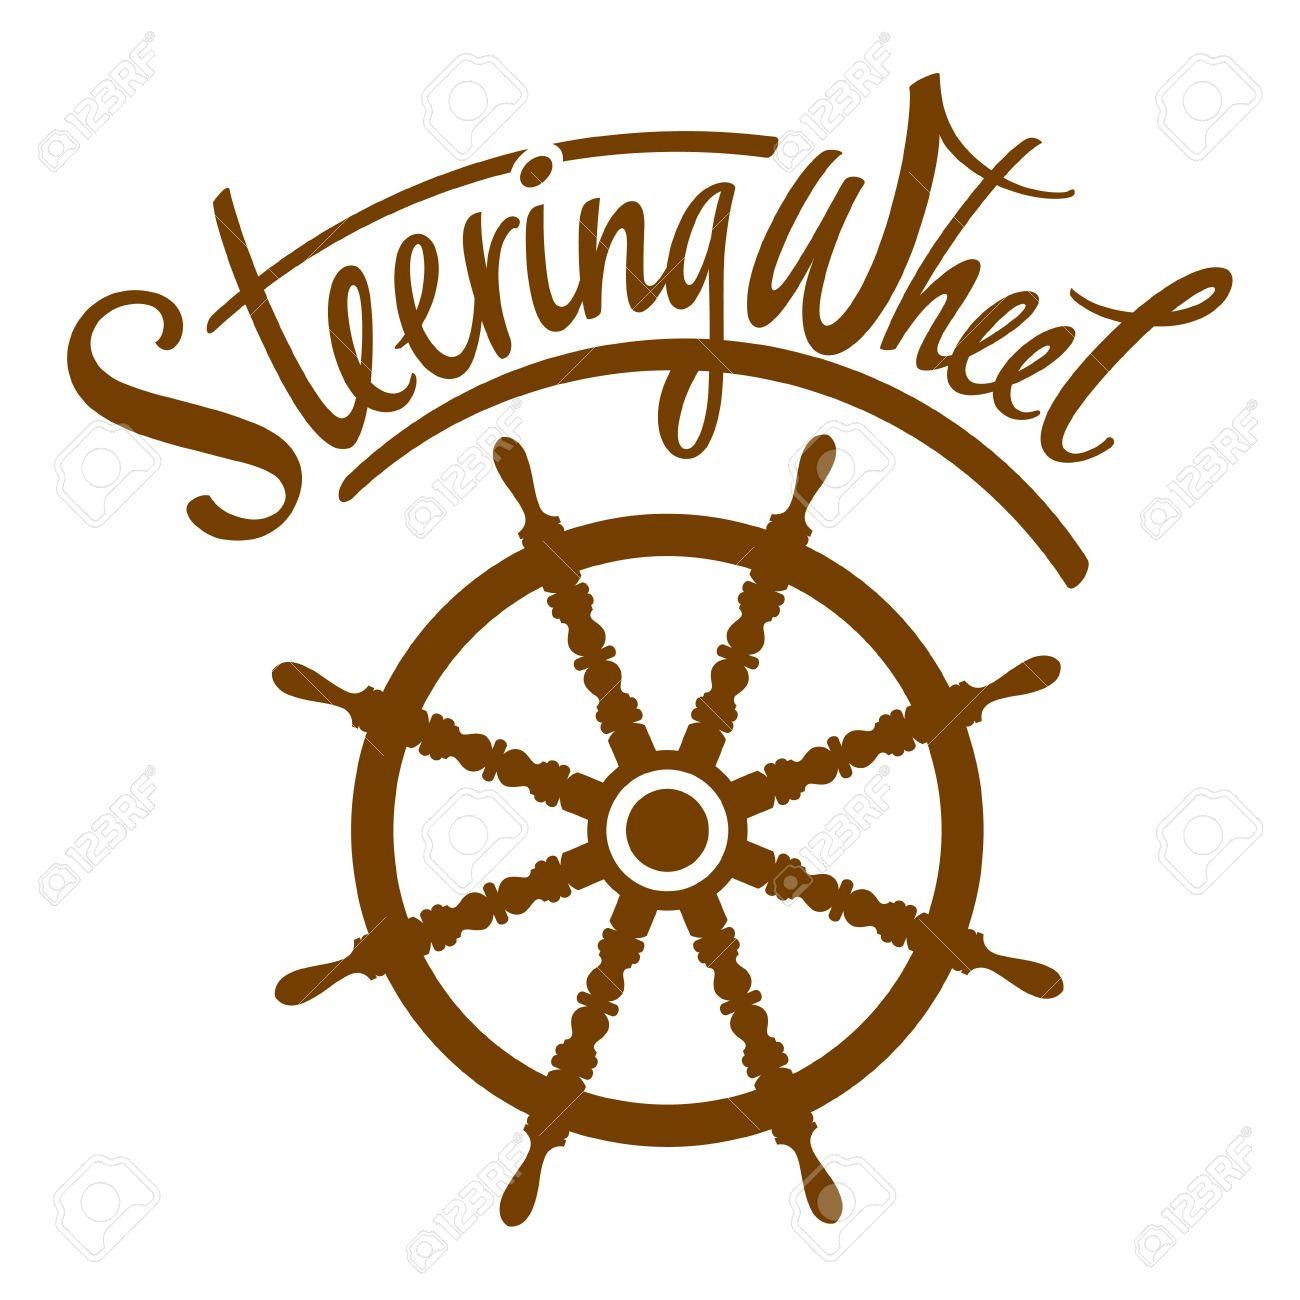 Sailboat clipart ship steering wheel Collection steering Steering Boat clipart